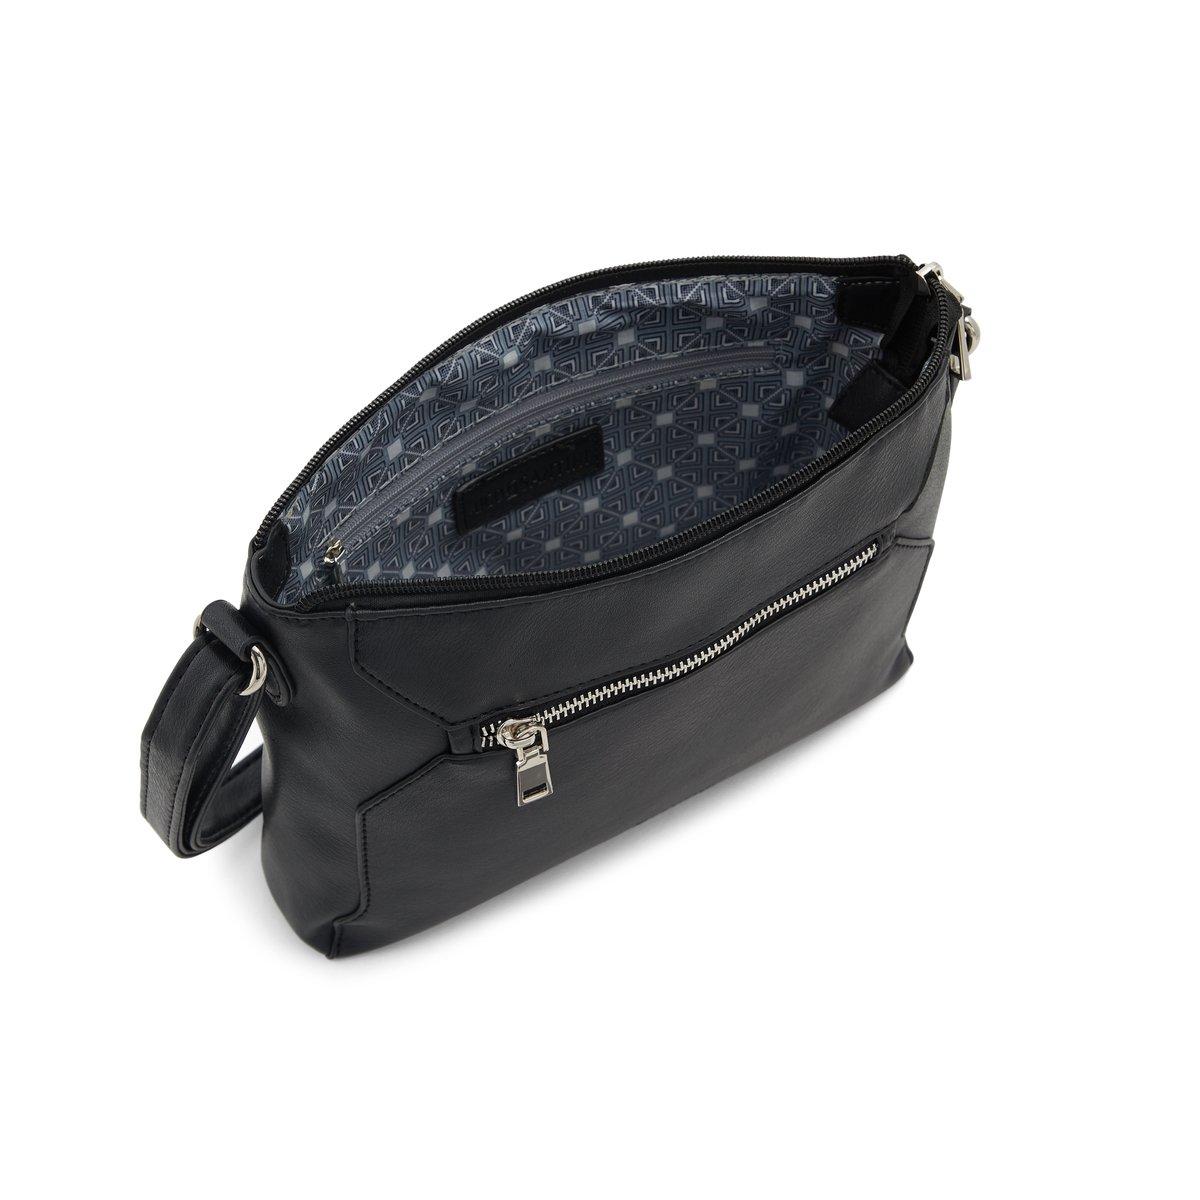 Globo Handbags Handbag Reviews 2020